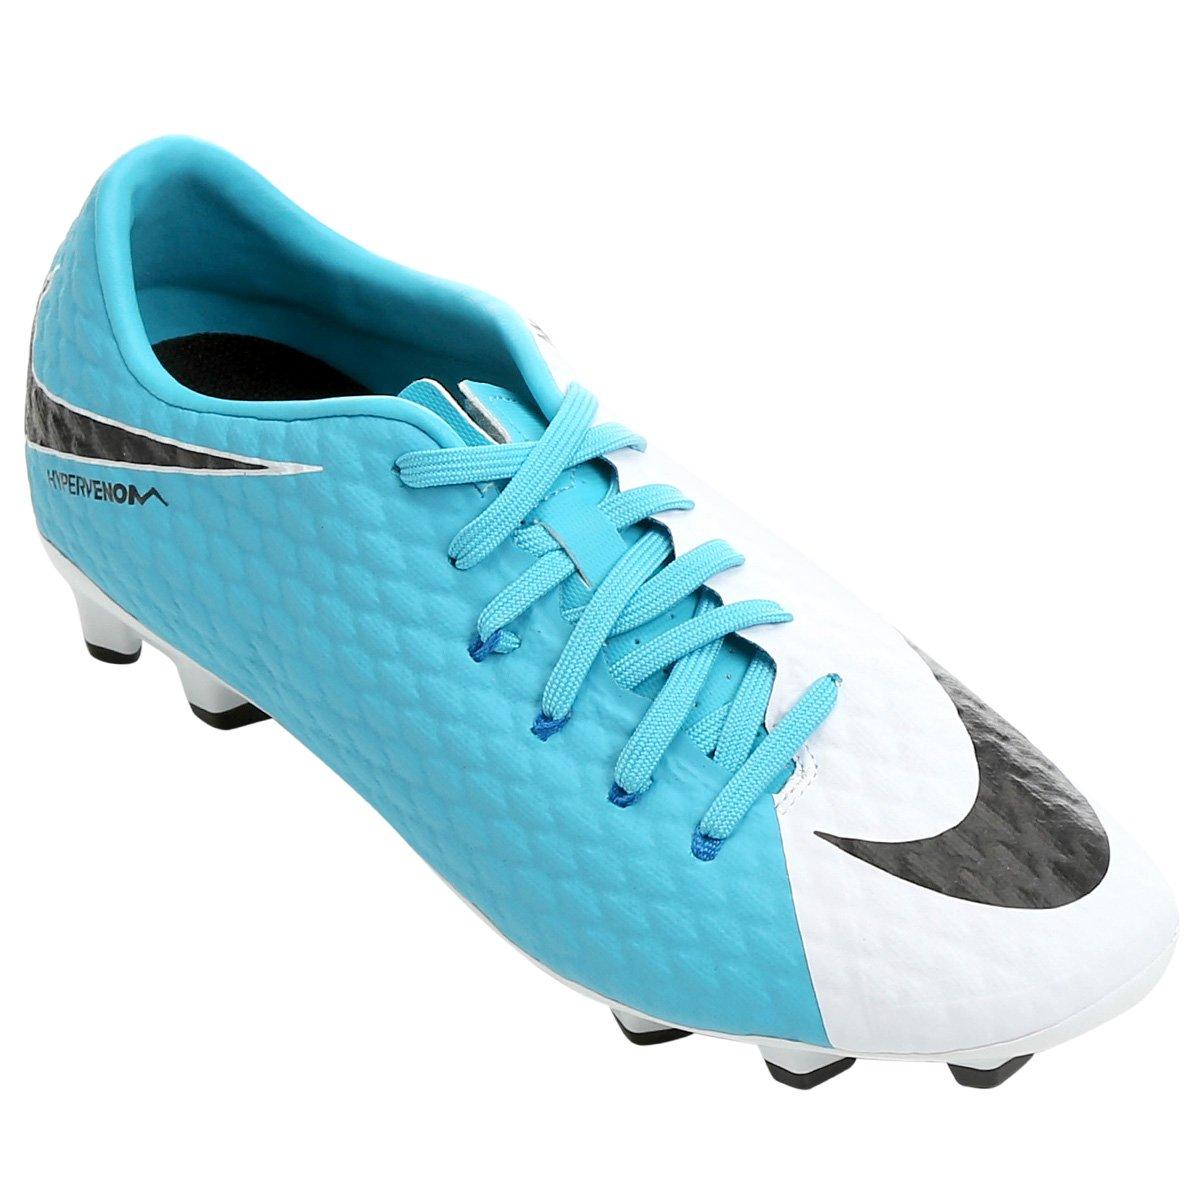 b82578a877 Chuteira Campo Nike Hypervenom Phelon 3 FG